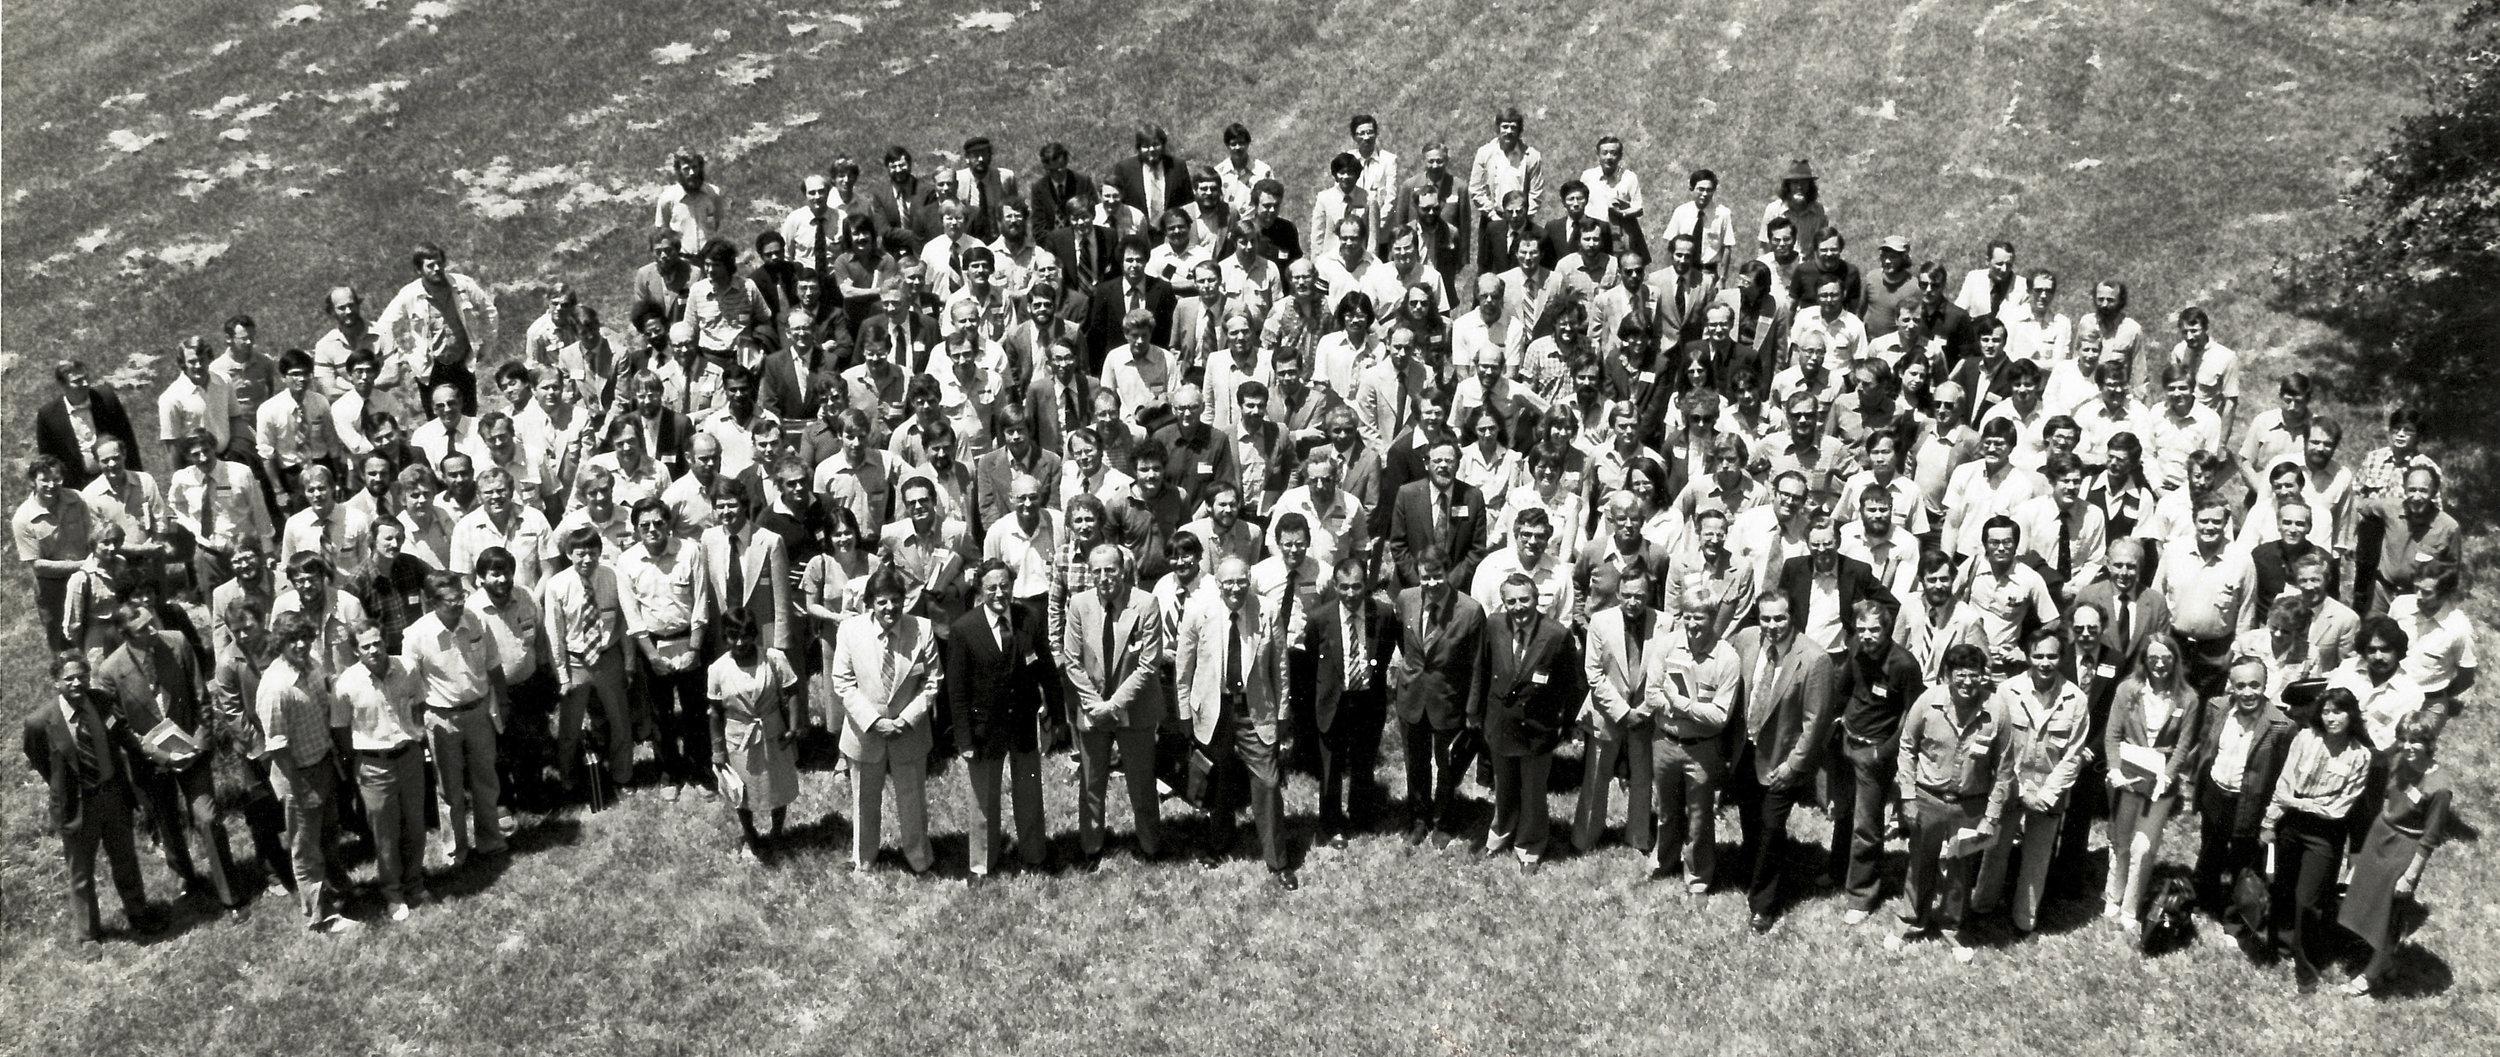 St. Louis, 1980